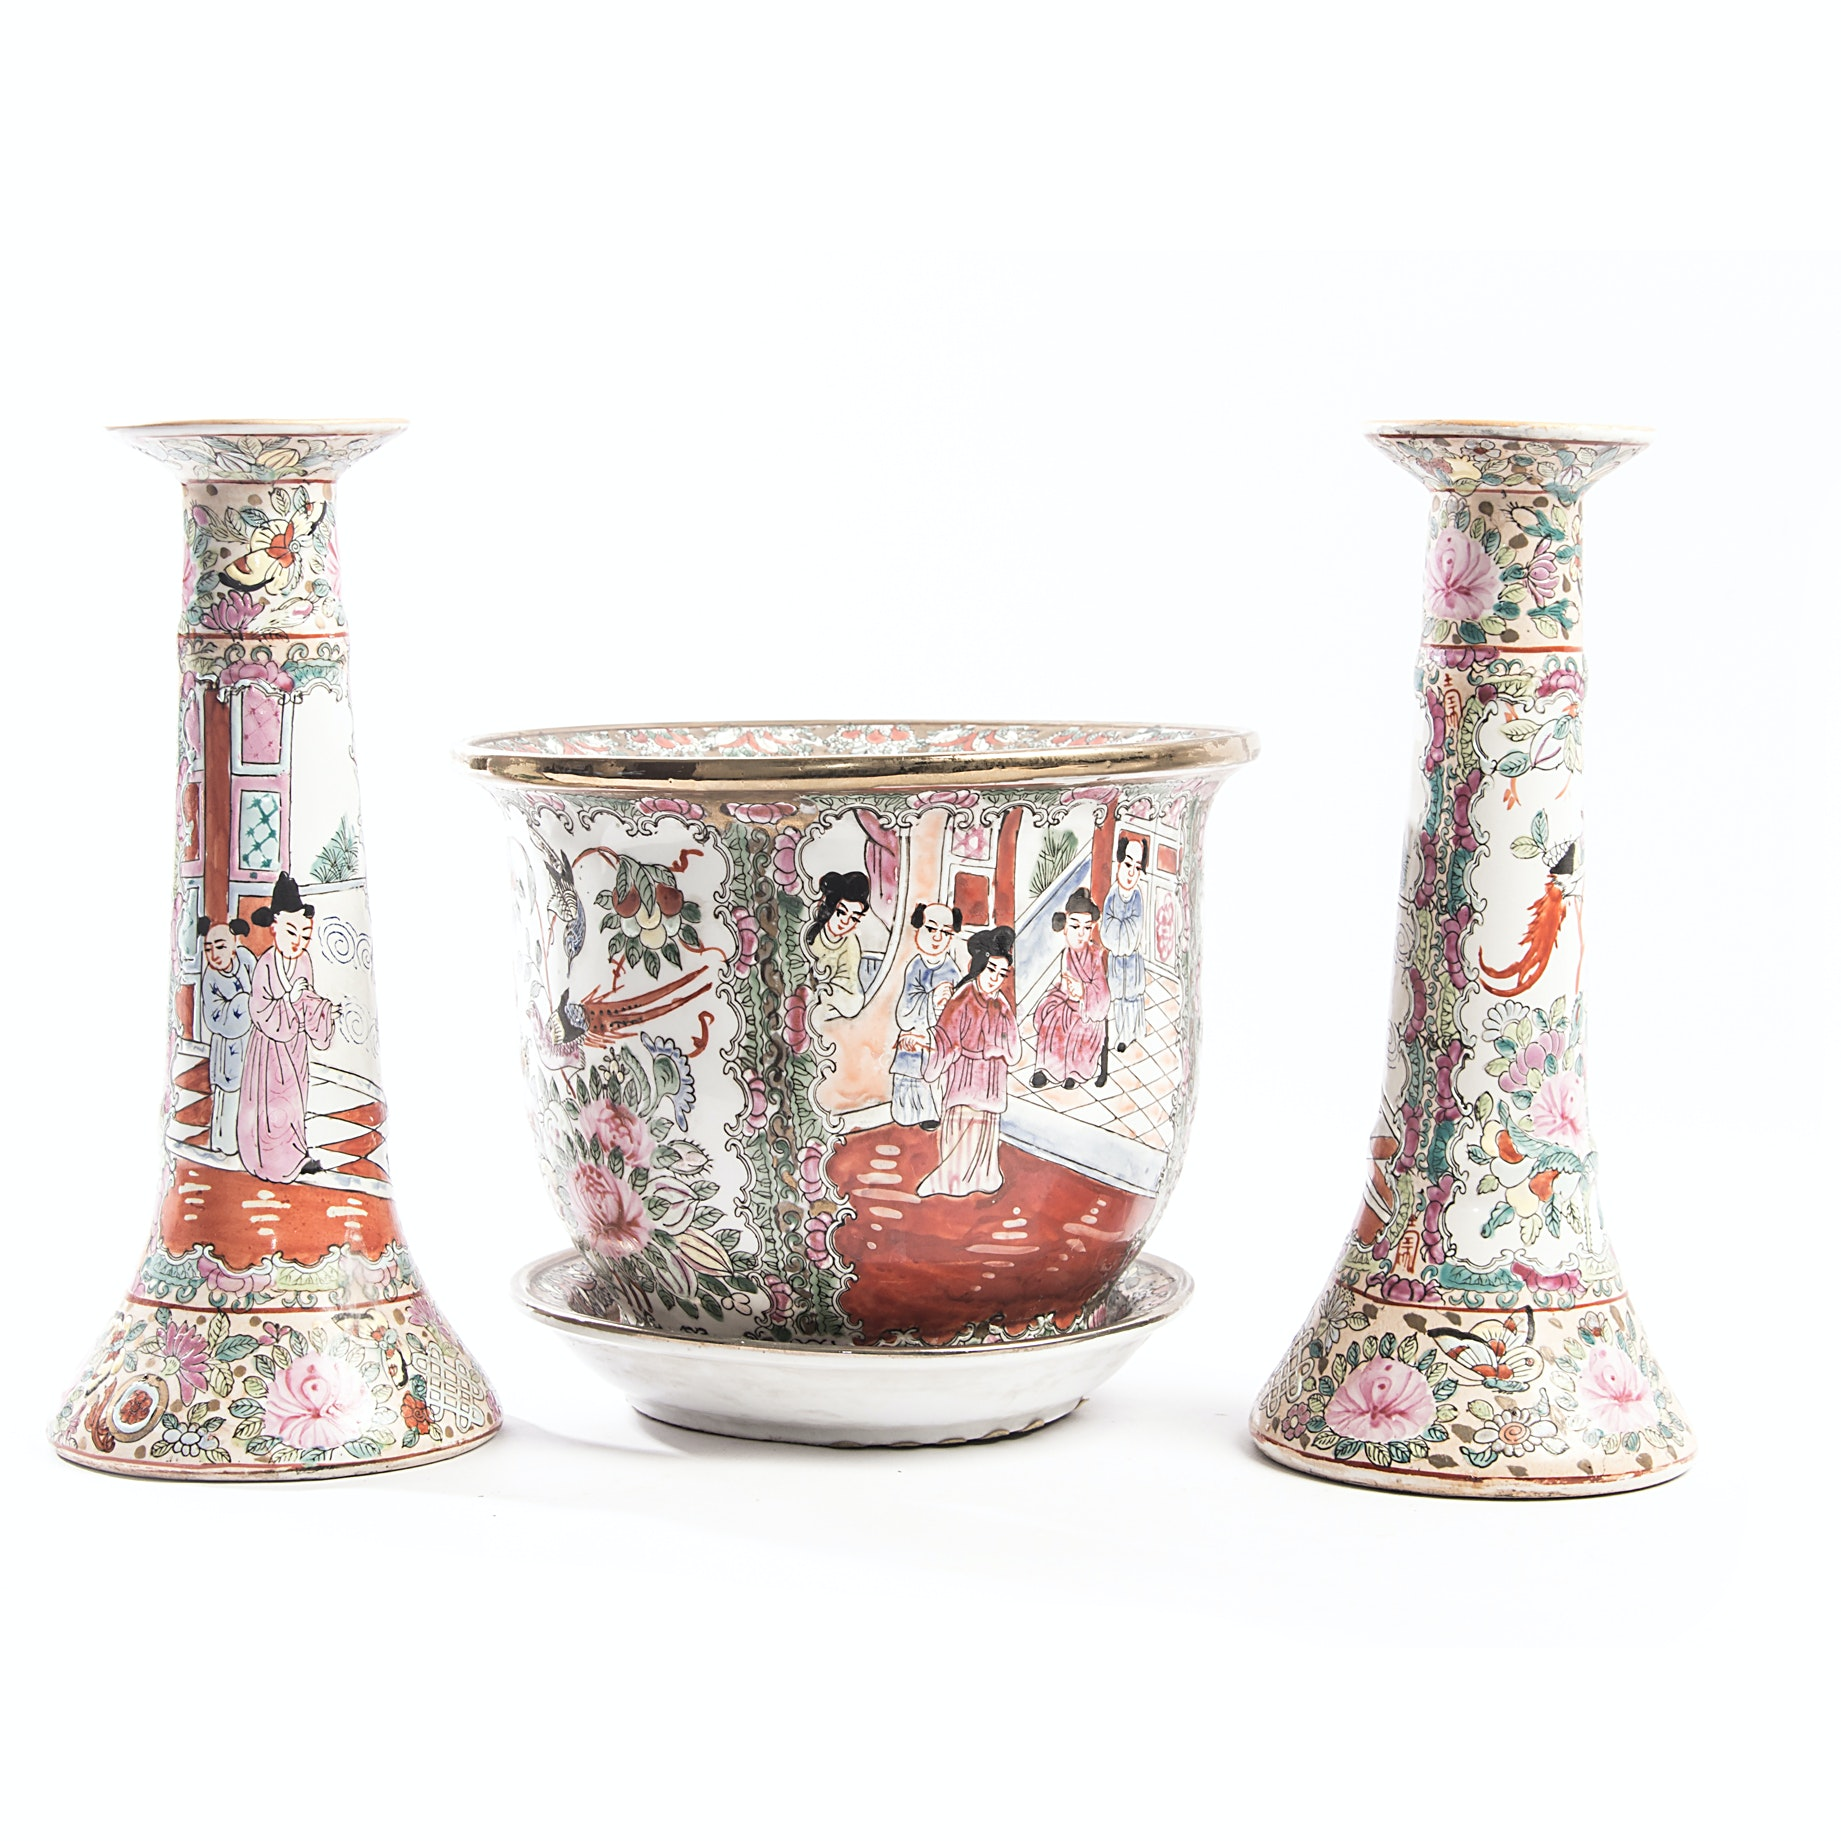 Chinese Rose Medallion Ceramics